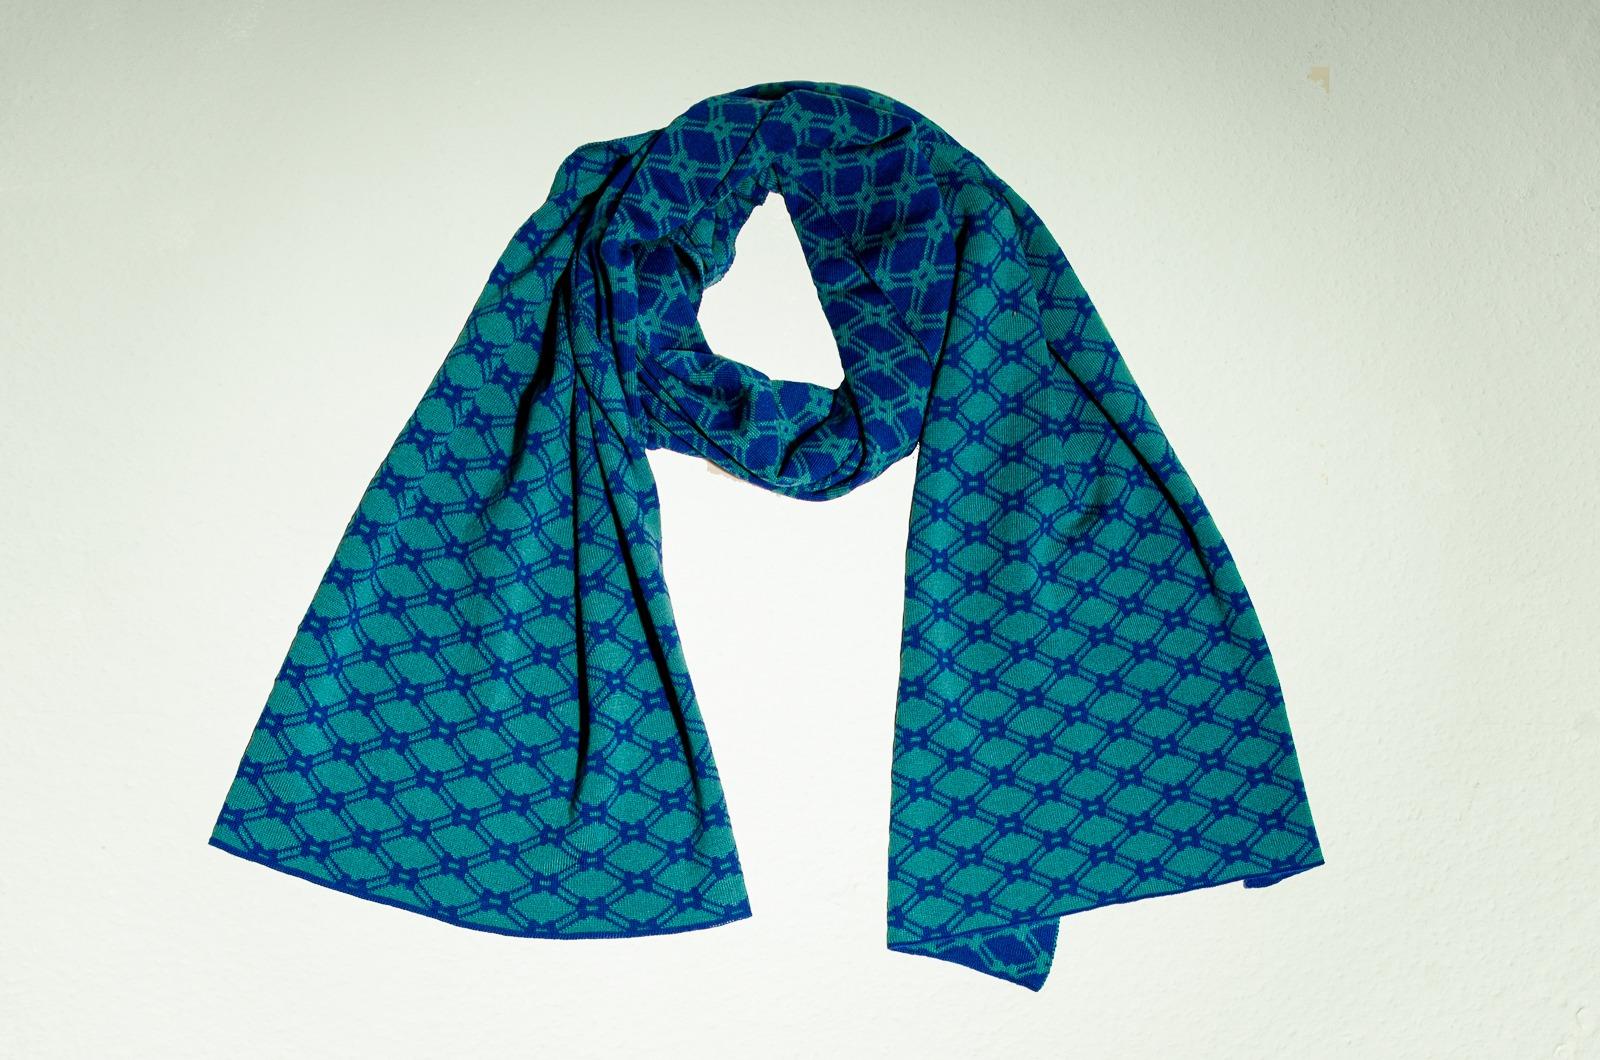 Merino Schal Netz II in blau